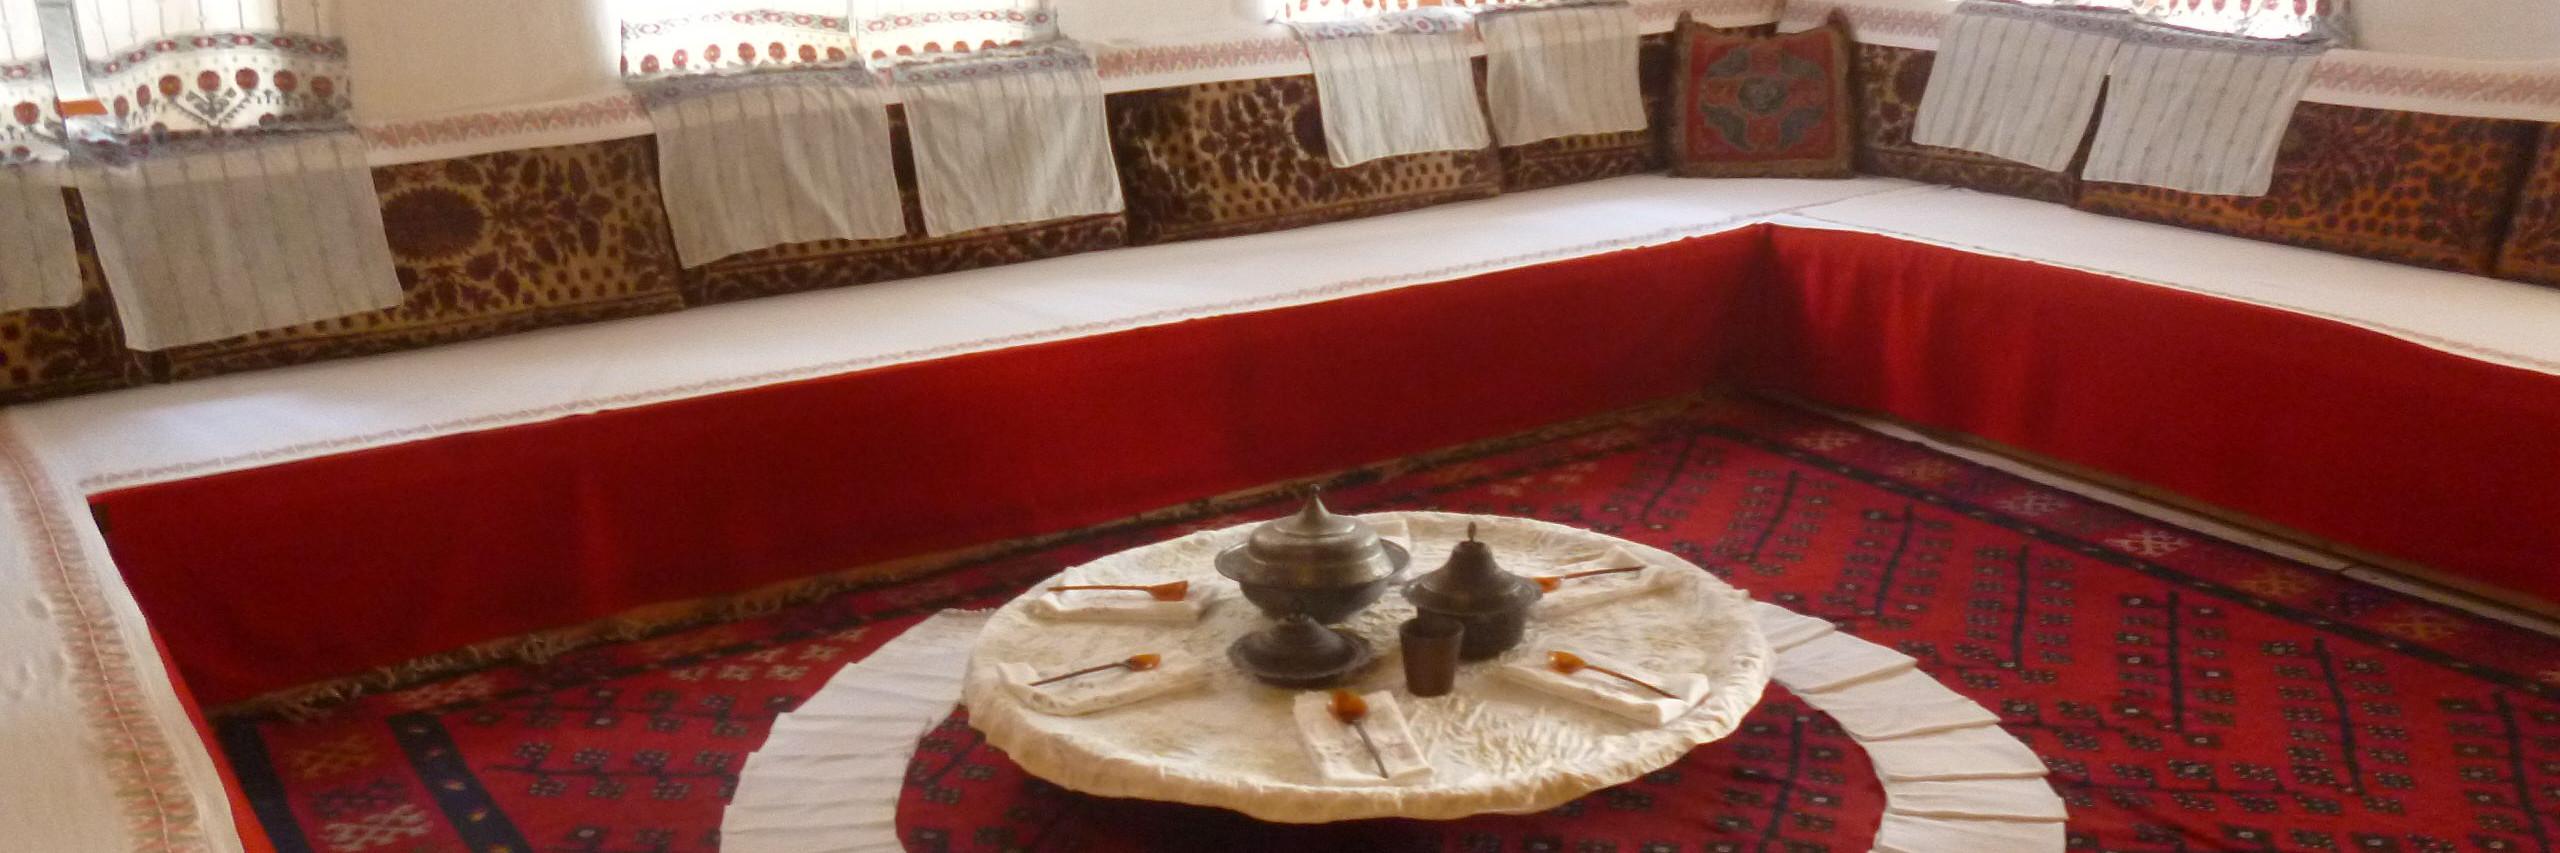 Антун Ханги об интерьере мусульманского дома